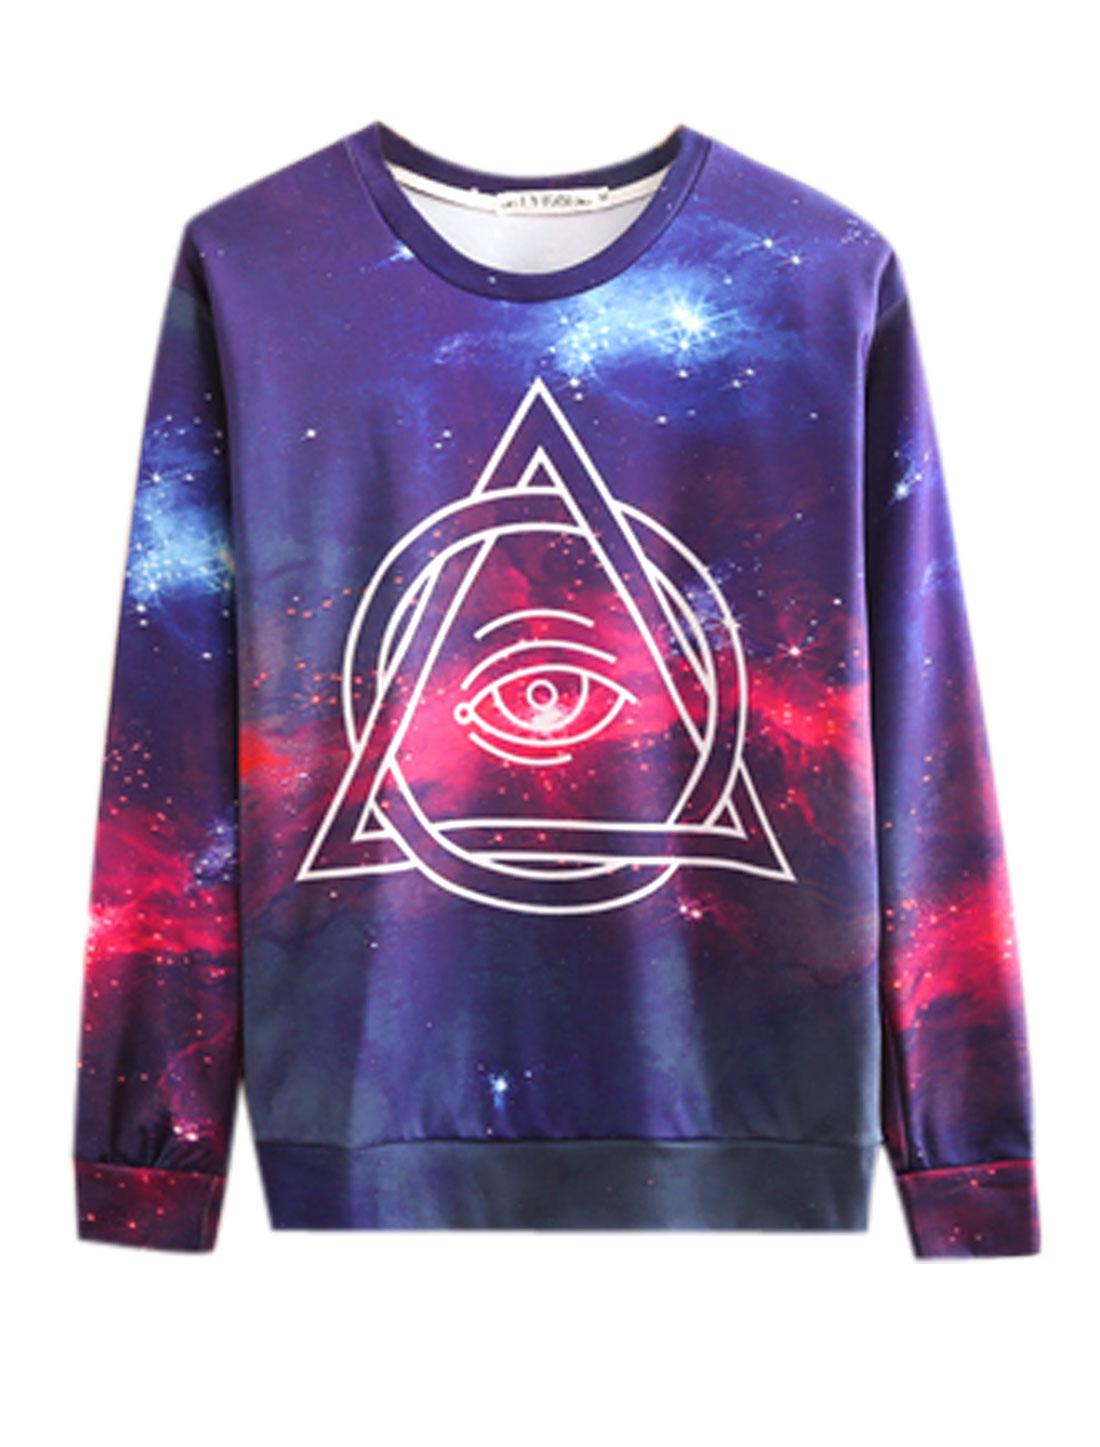 Men Round Neck Long Sleeves Geometric Prints Leisure Sweatshirt Purple M